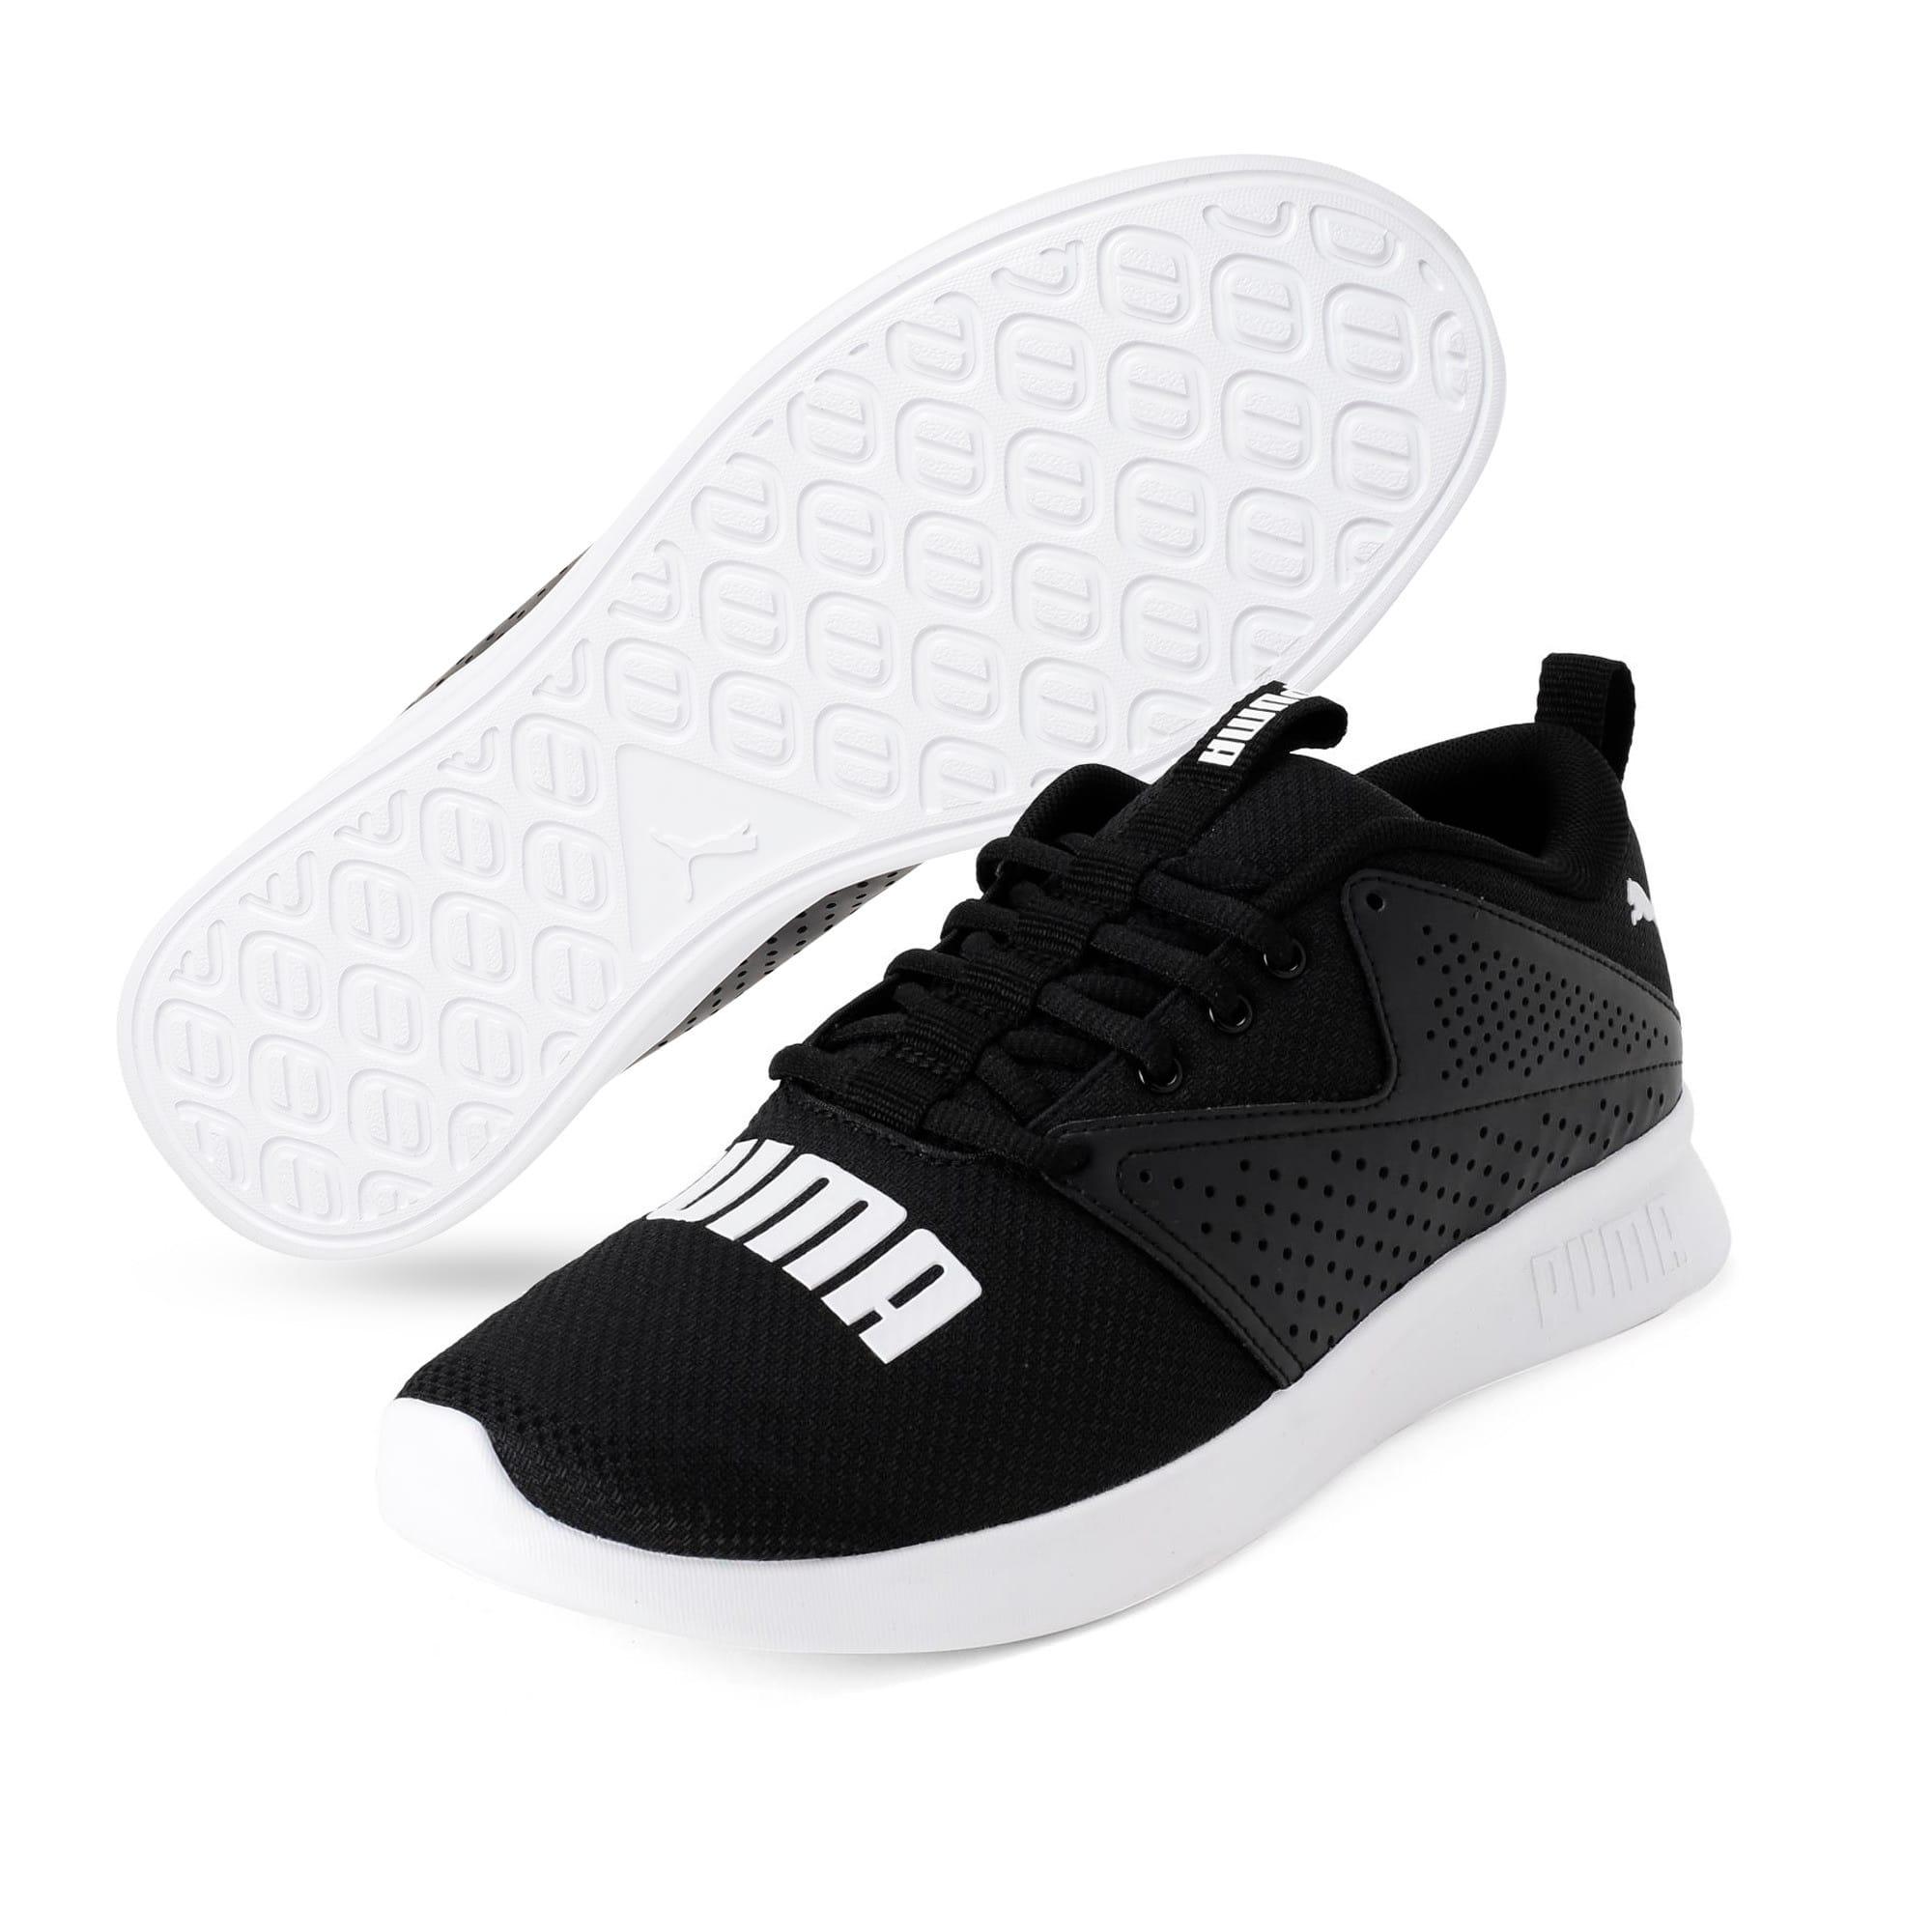 Thumbnail 6 of Detector Men's Running Shoe, Puma Black-Puma White, medium-IND